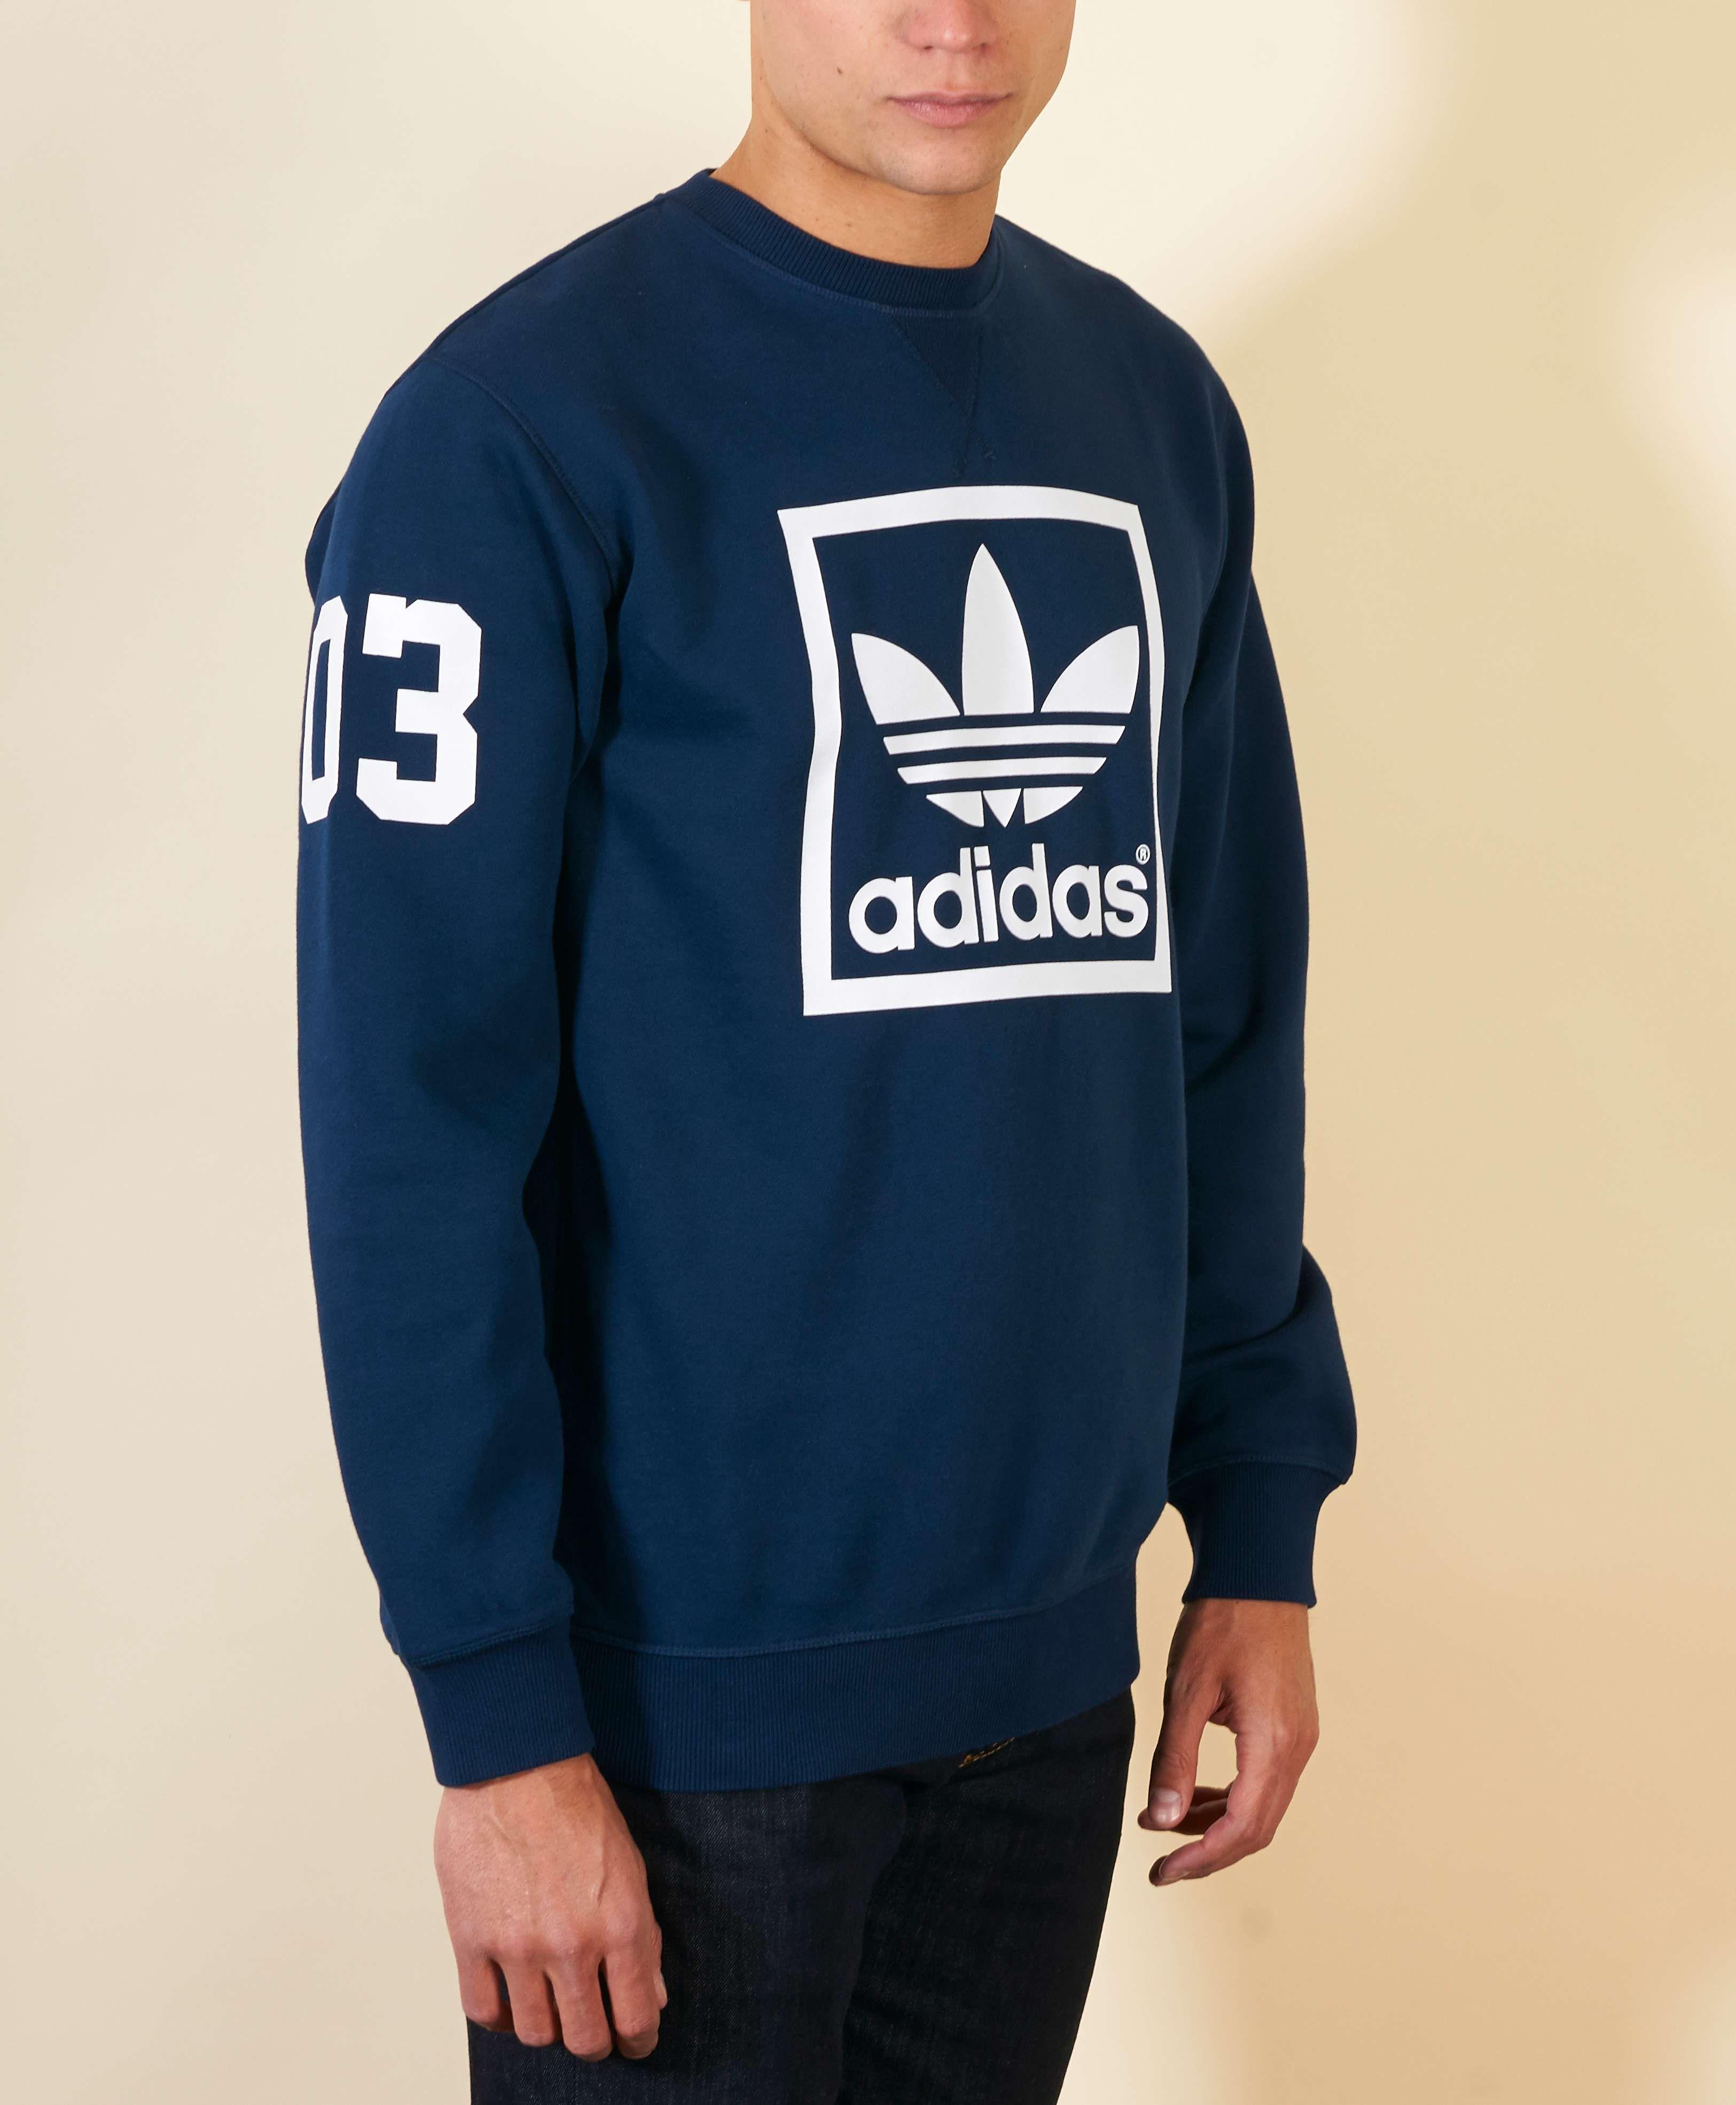 Adidas Originals 3 Foil Sweatshirt